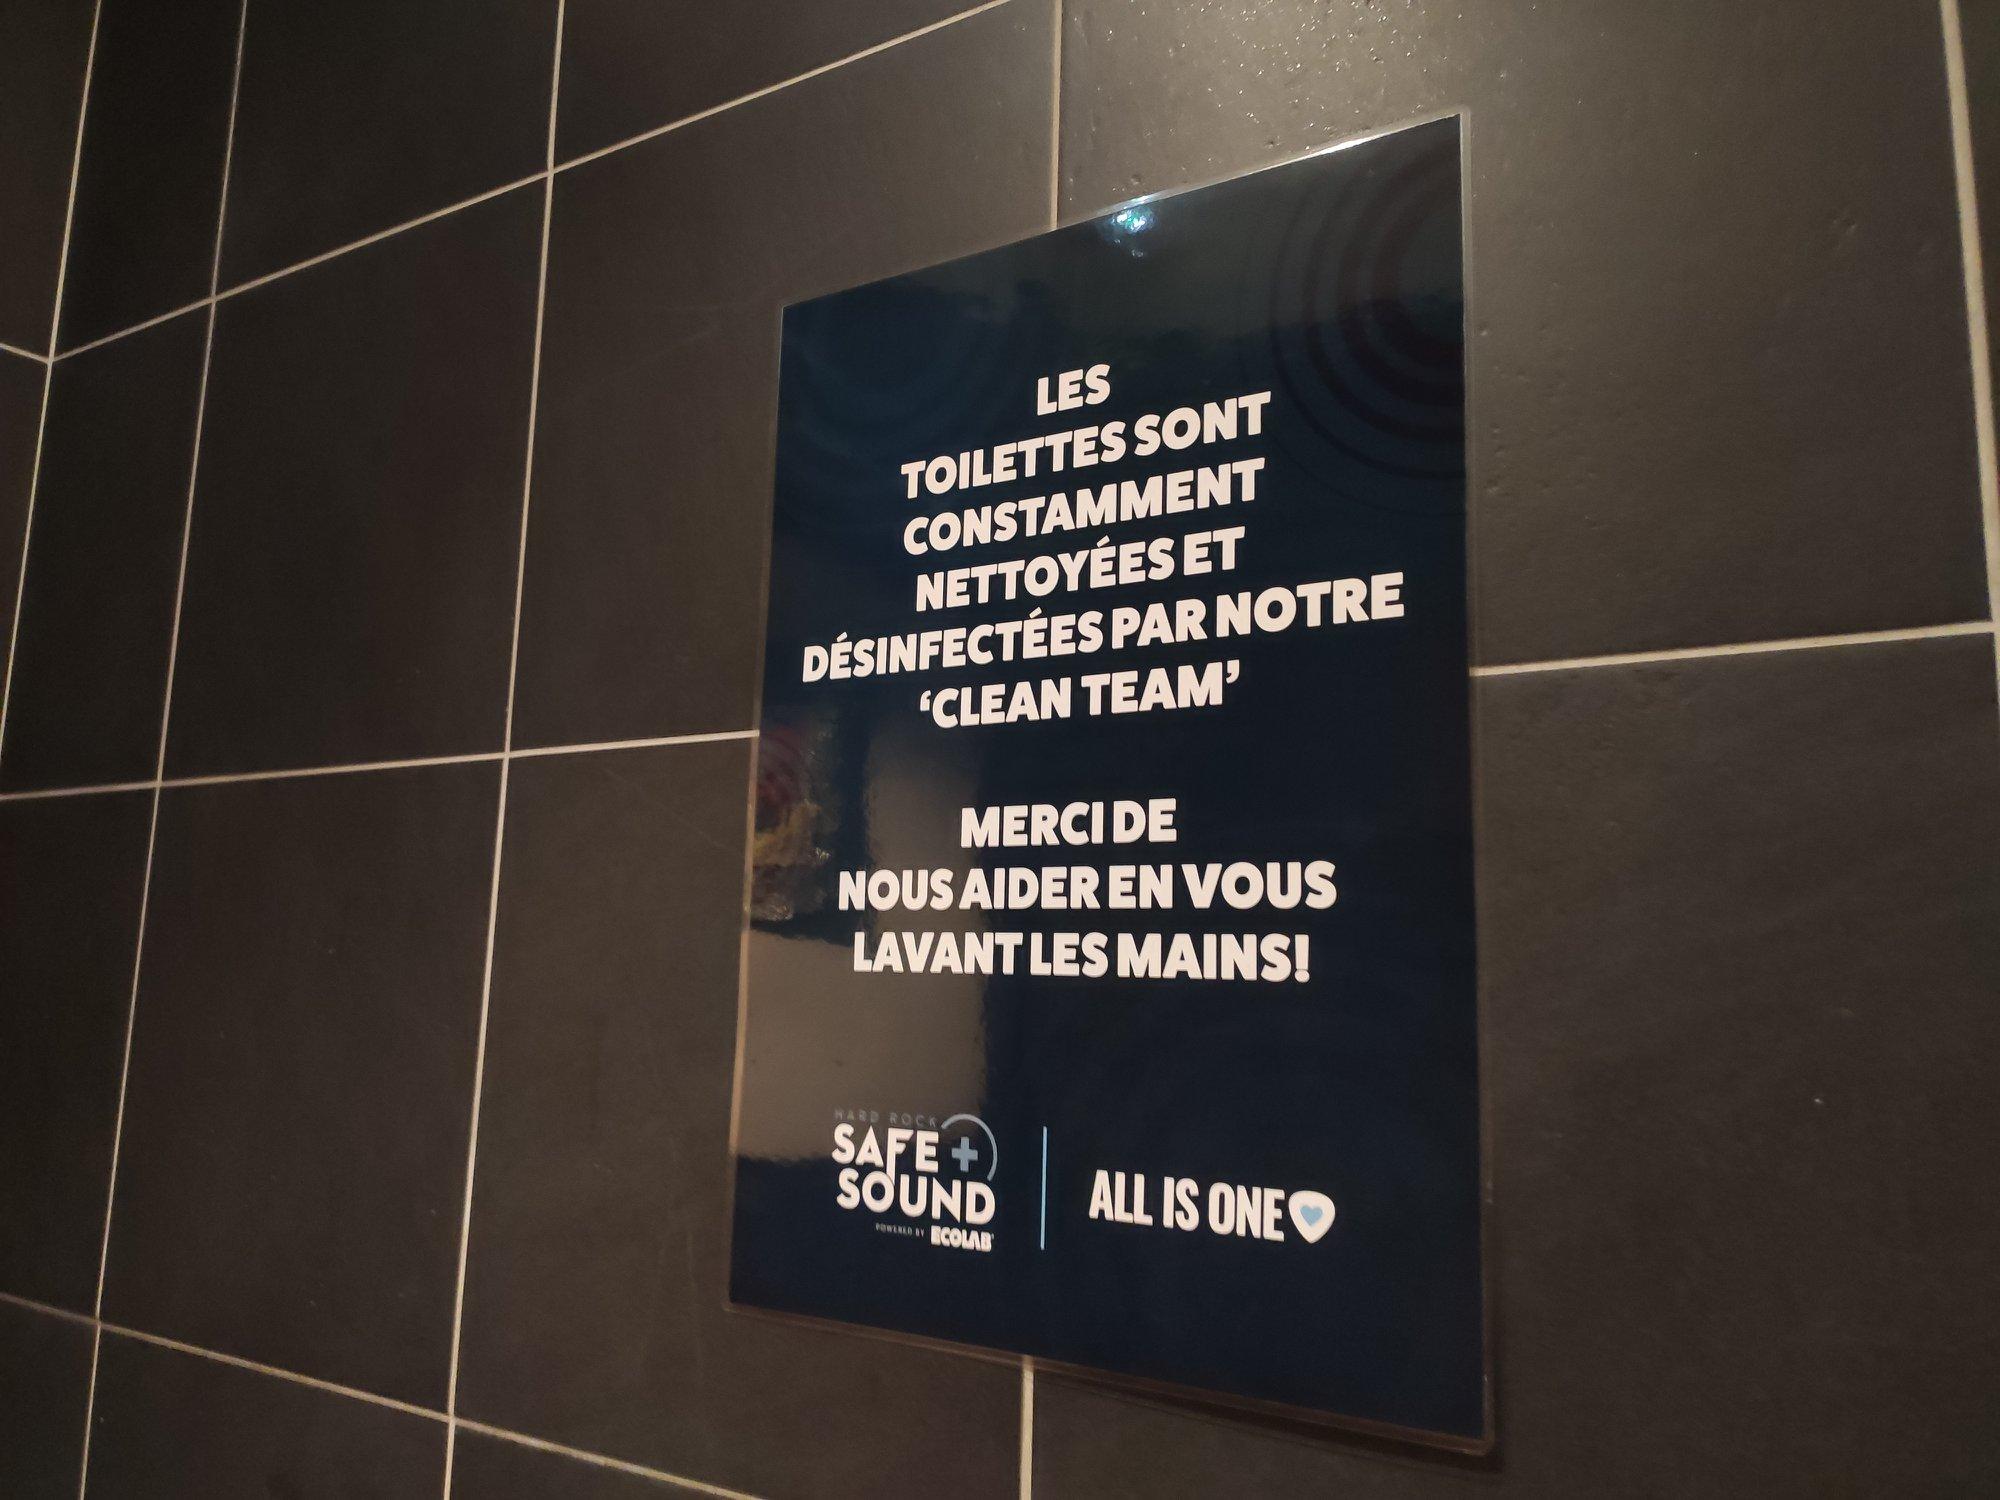 Hard Rock Cafe - Clean team